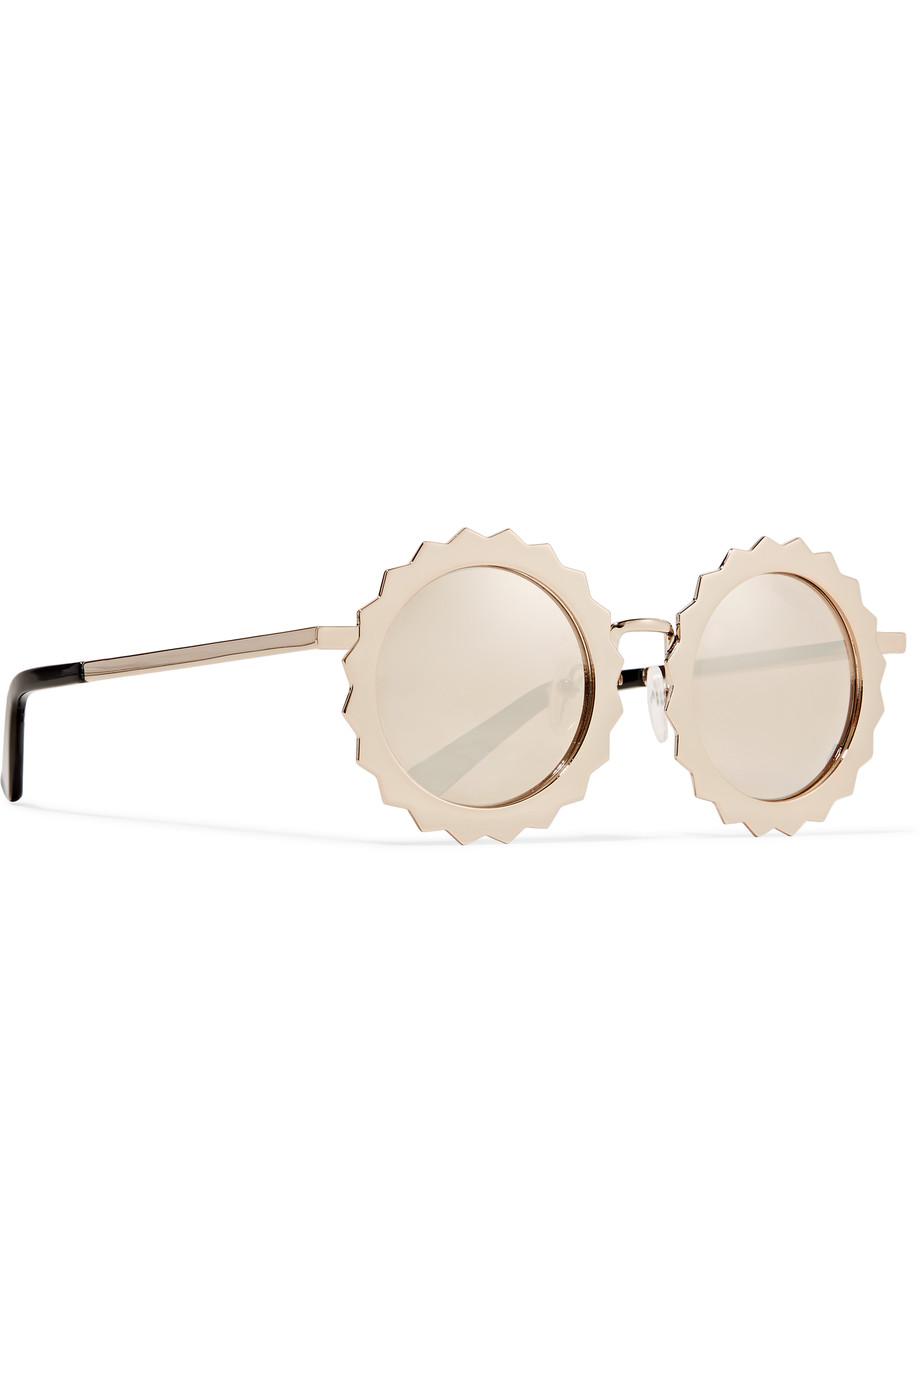 House Of Holland Seeing-Stars Sunglasses